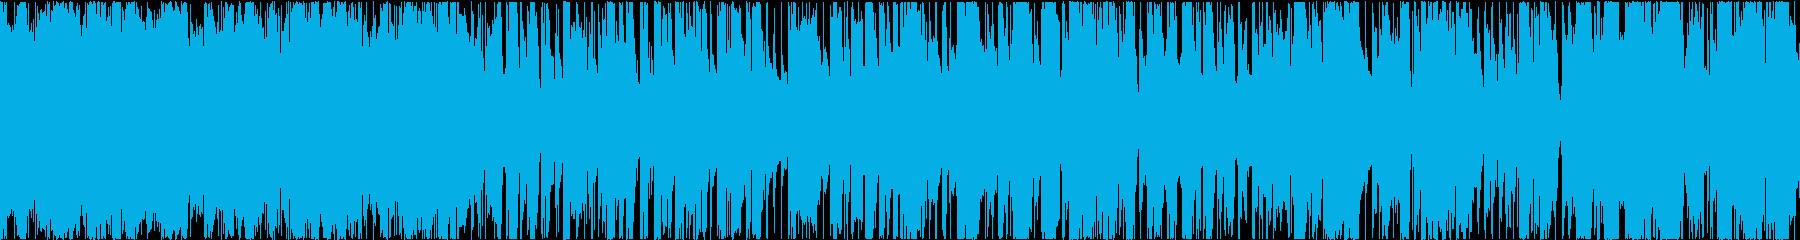 Rap用トラックの再生済みの波形